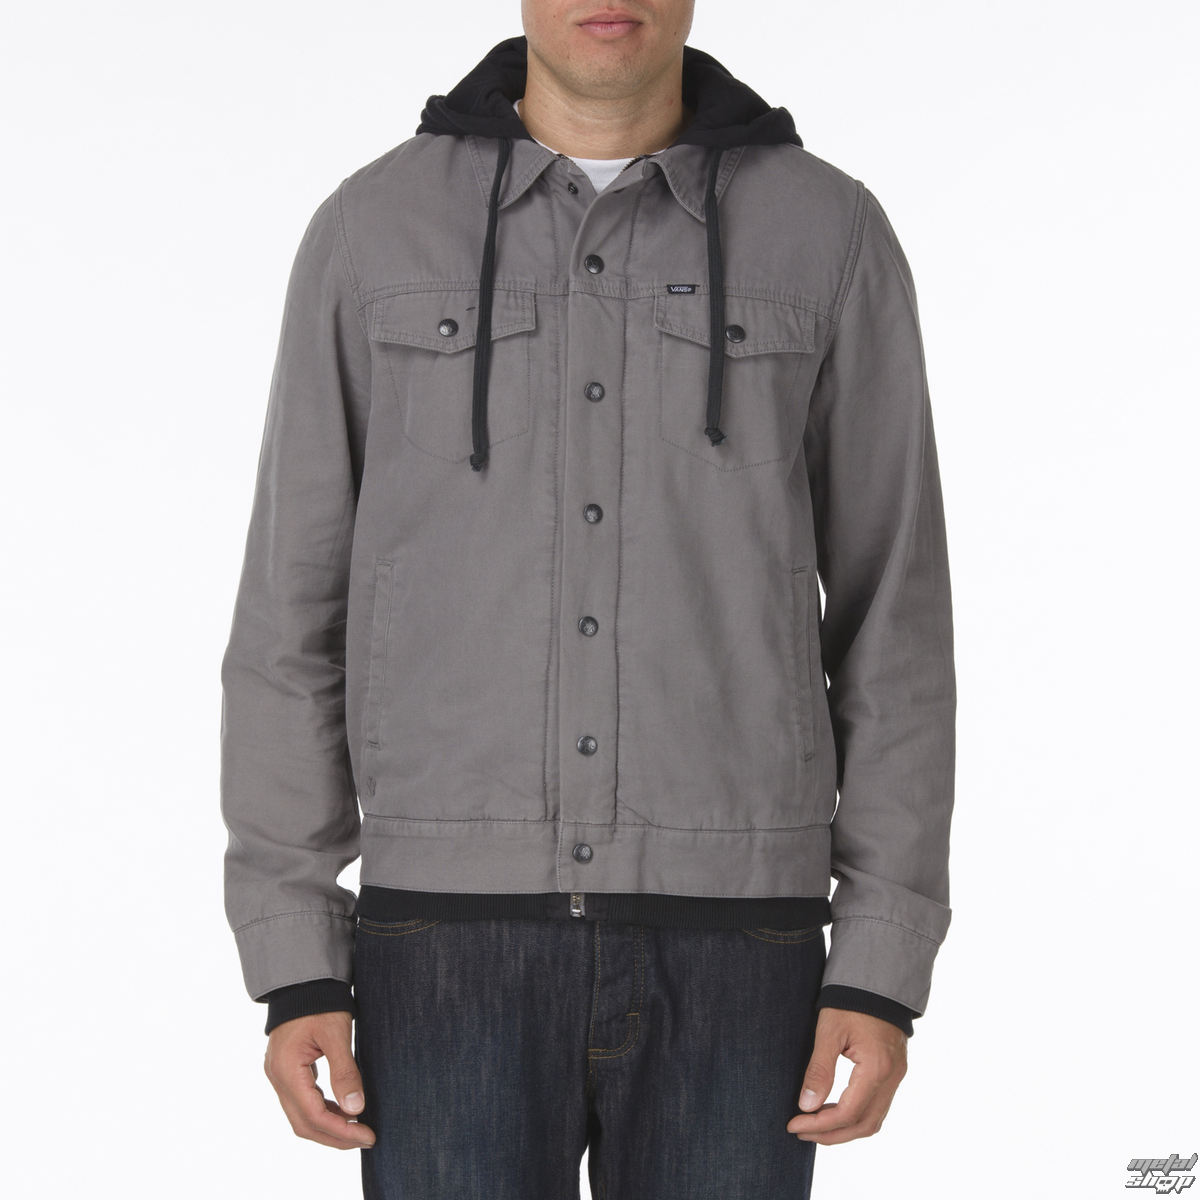 59659aacef spring fall jacket men s - M AV Edict - VANS - VJFF98S - metal-shop.eu